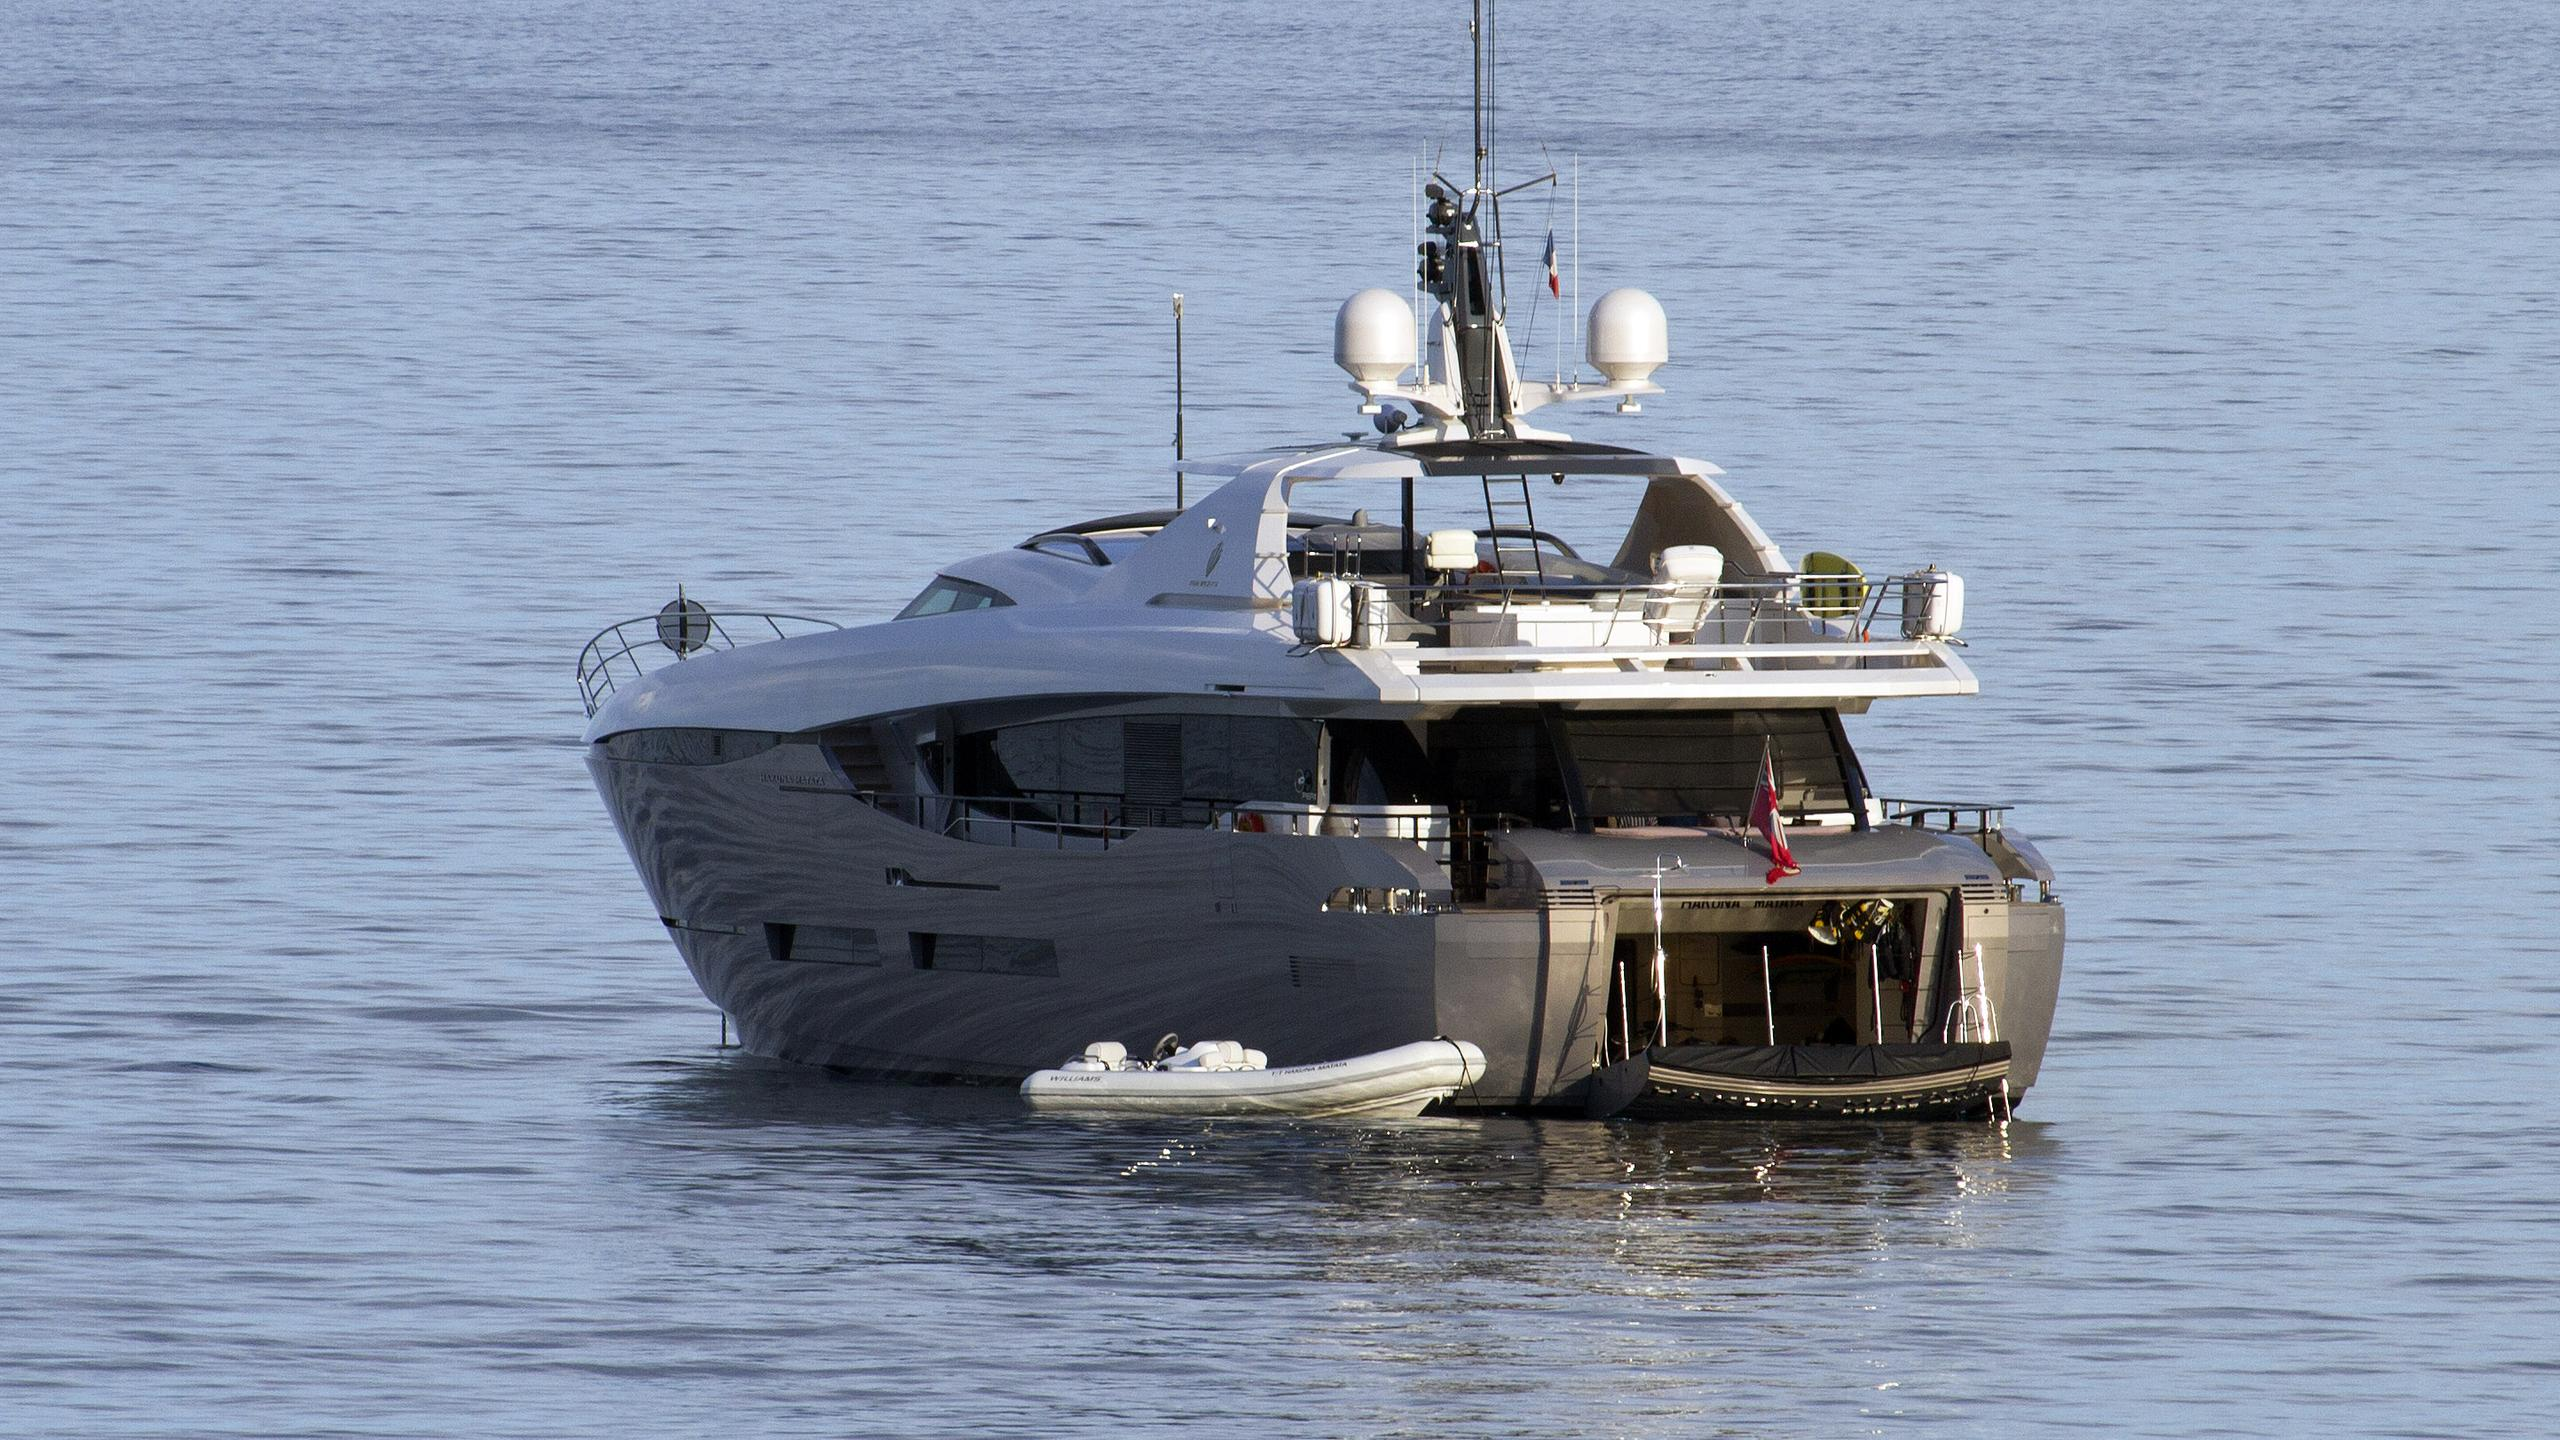 hakuna-matata-motoryacht-peri-yachts-2011-38m-half-stern